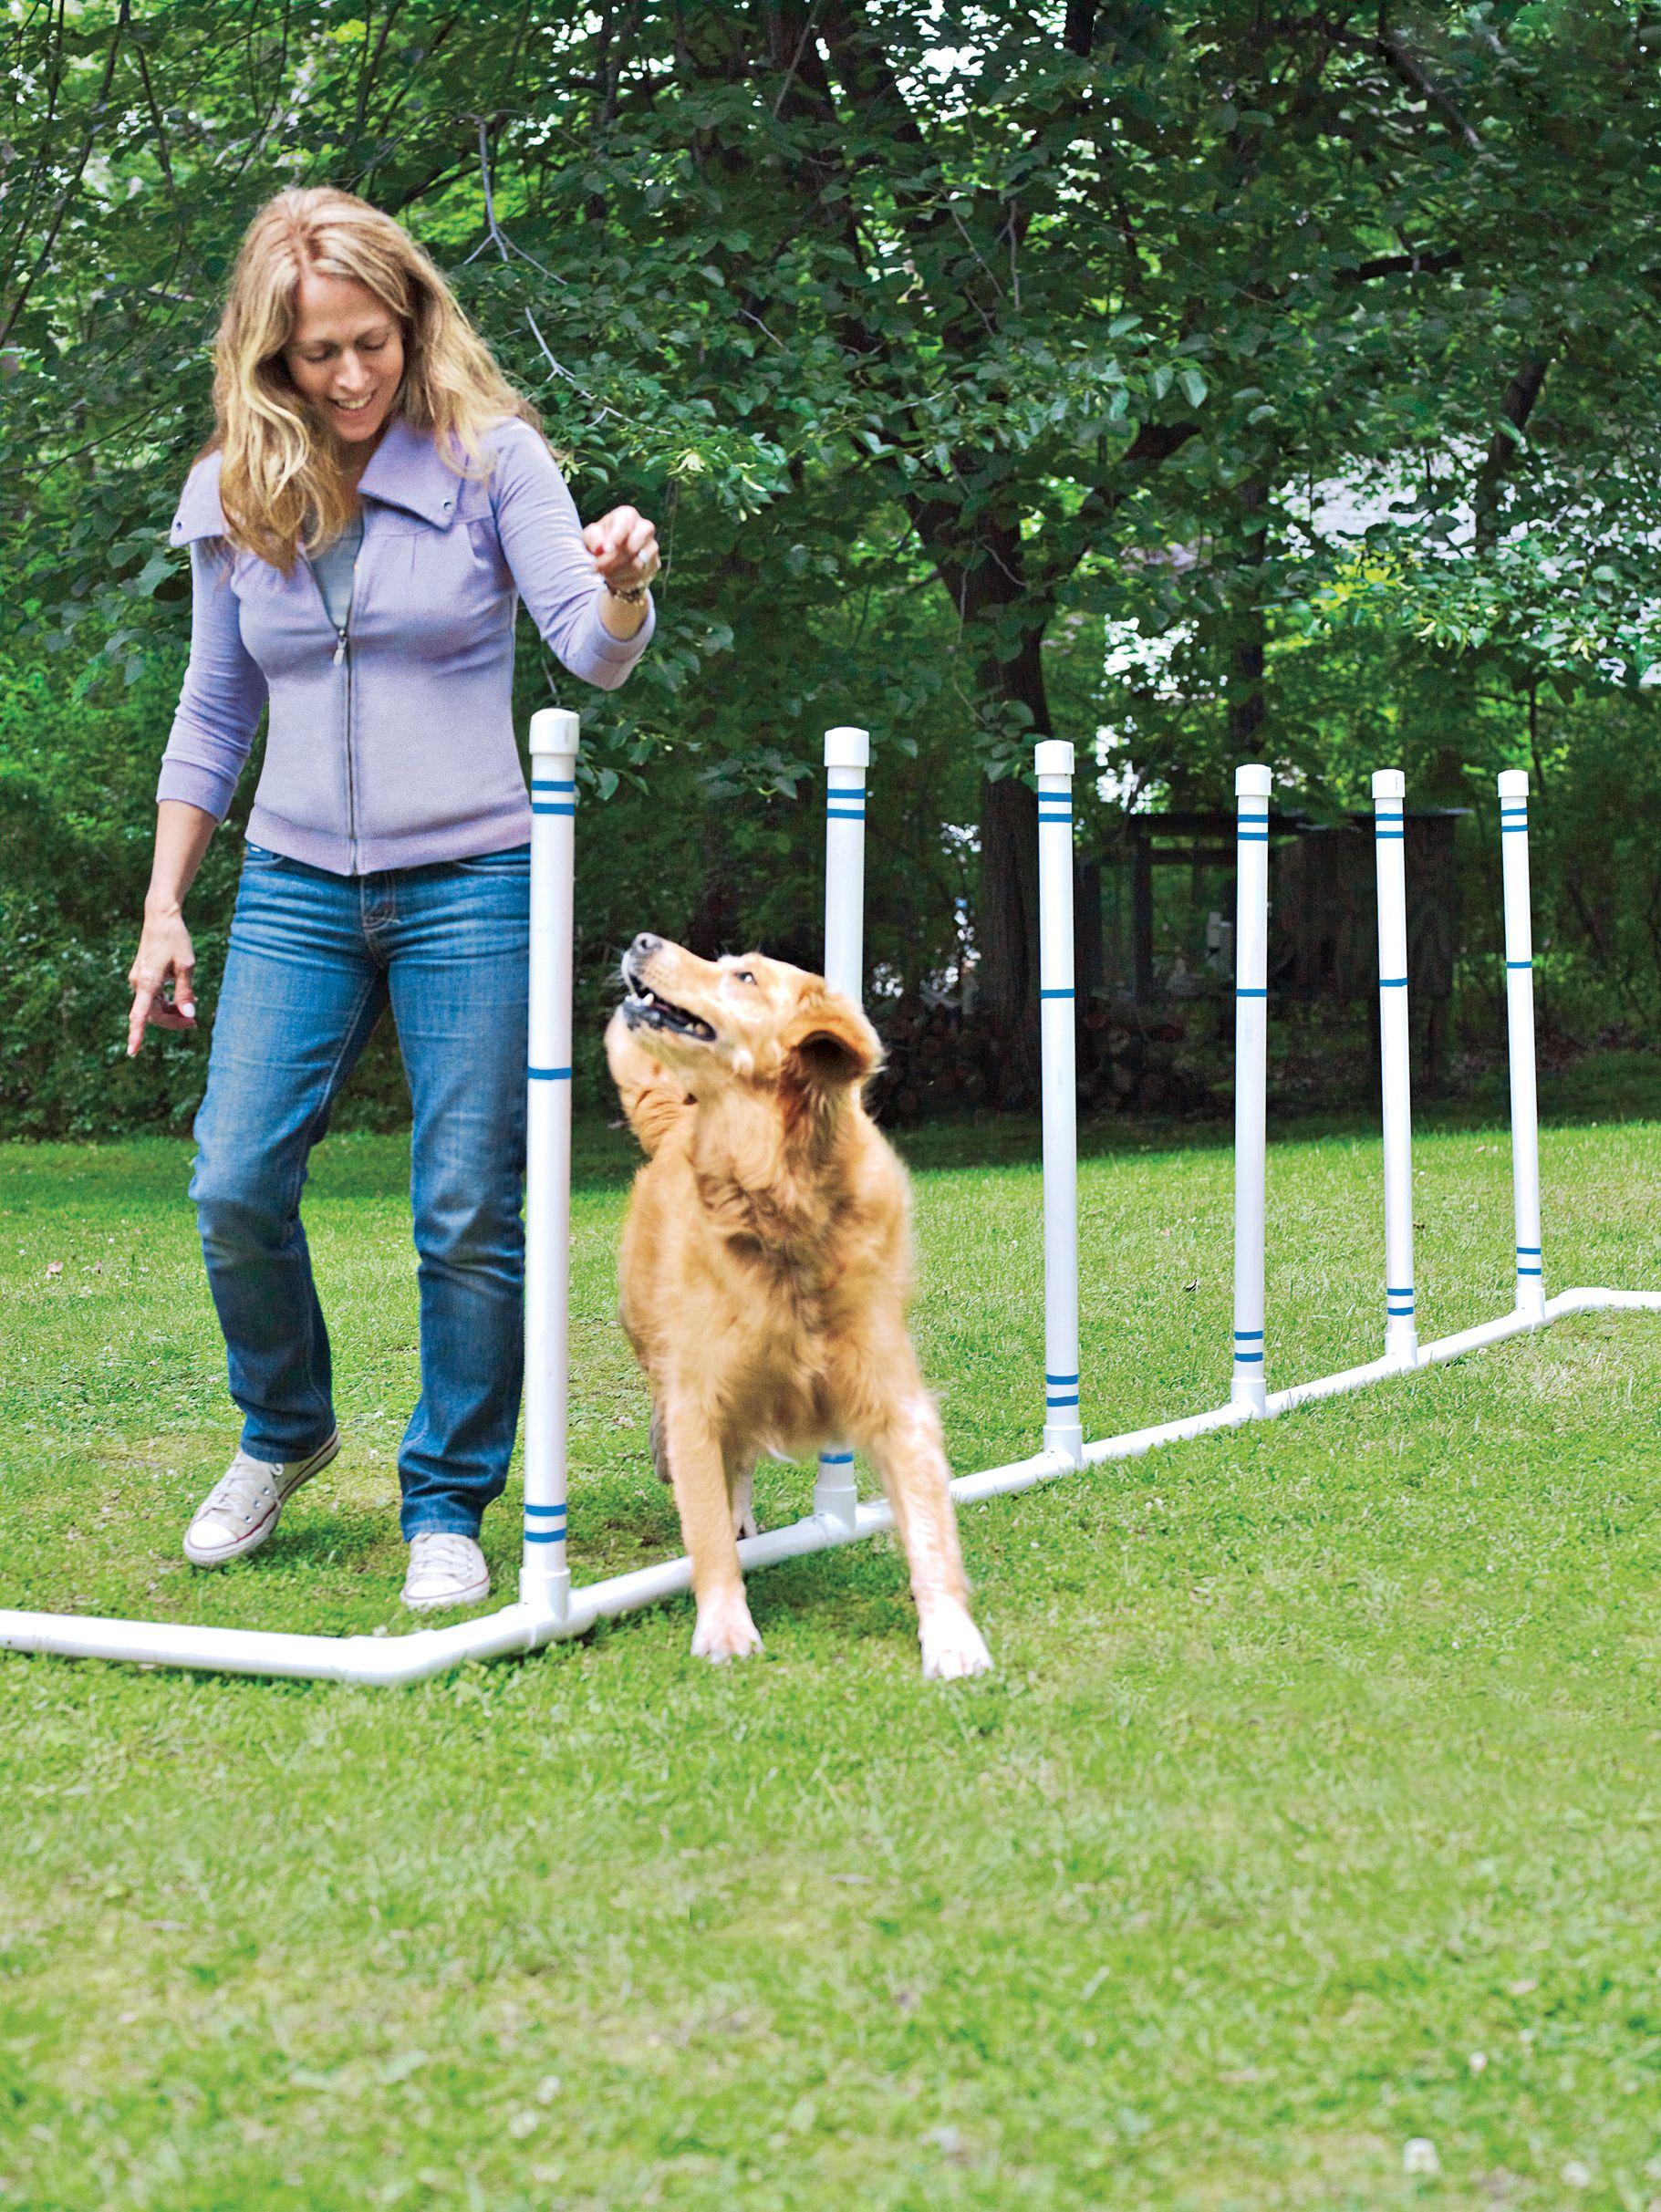 How To Build A Diy Dog Agility Course Porch Agility Training